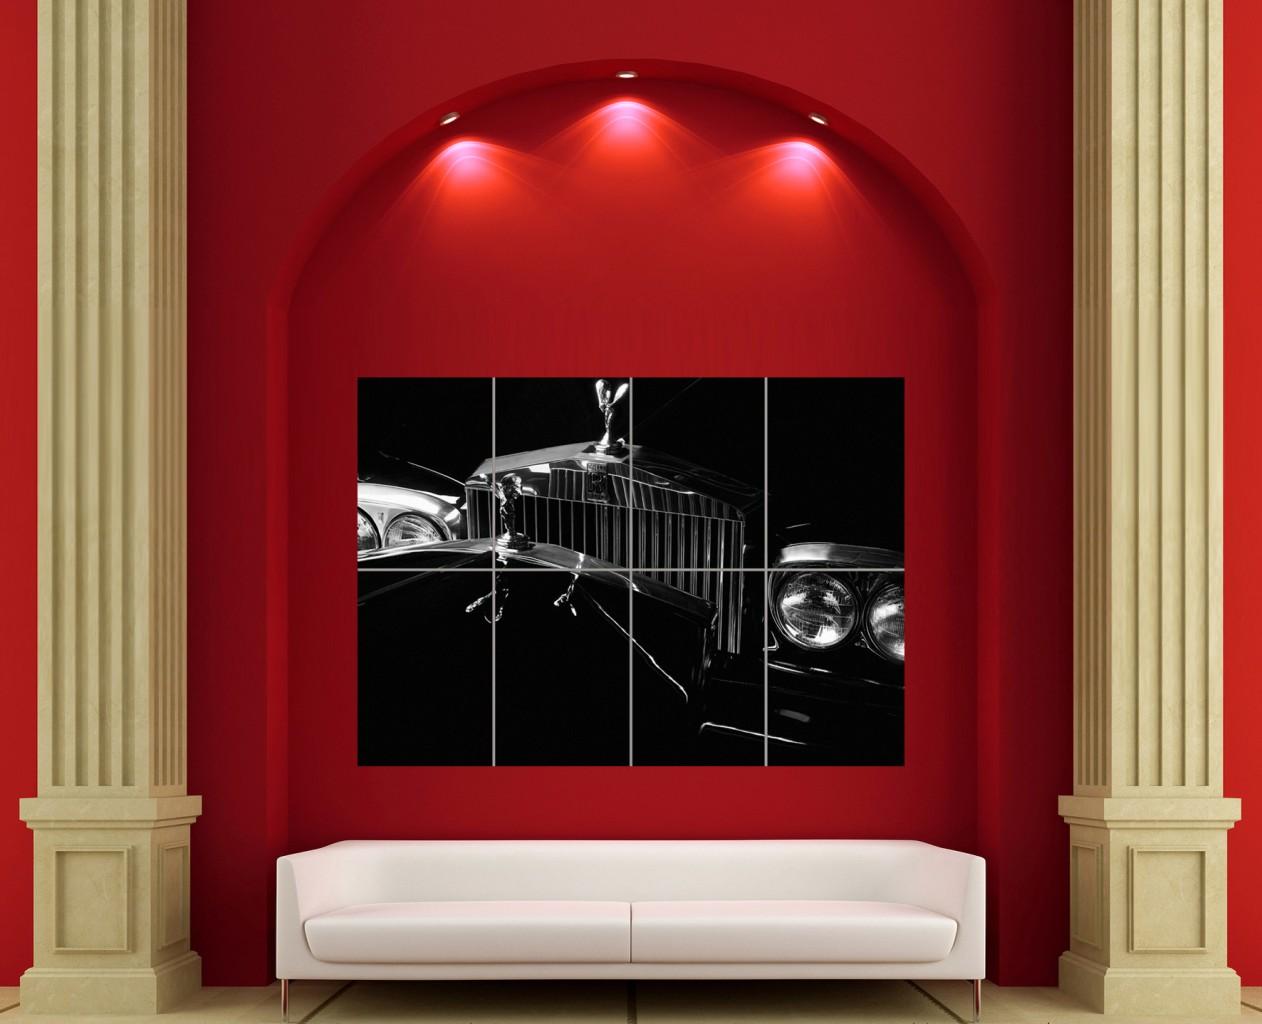 ROLLSROYCE ART GIANT POSTER PICTURE PRINT X...